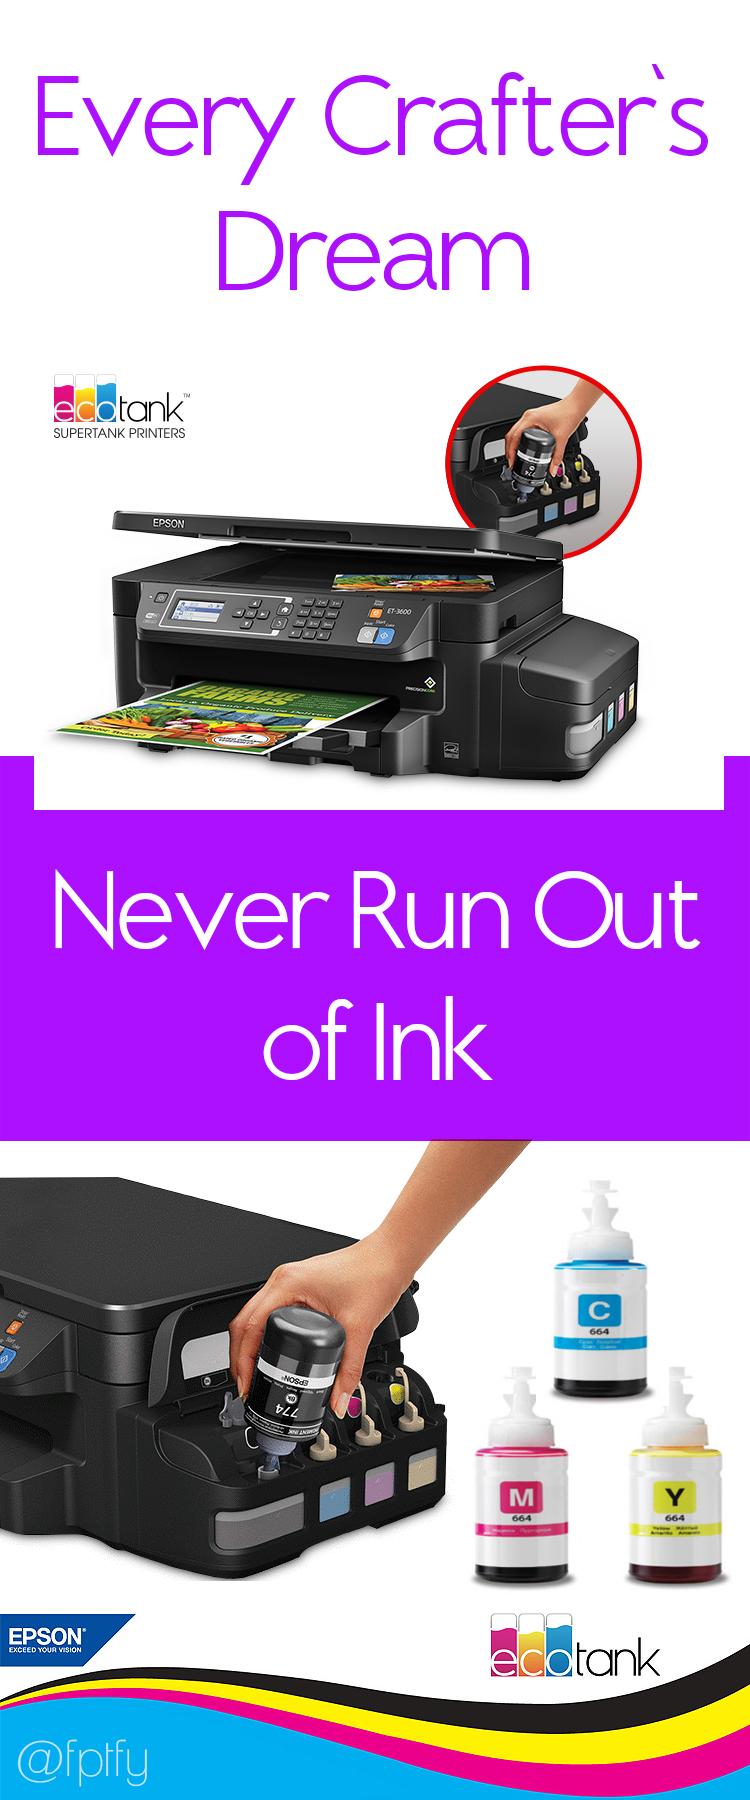 Best printer epson ecotank business cricut and craft best printer epson ecotank free pretty things for you business card colourmoves